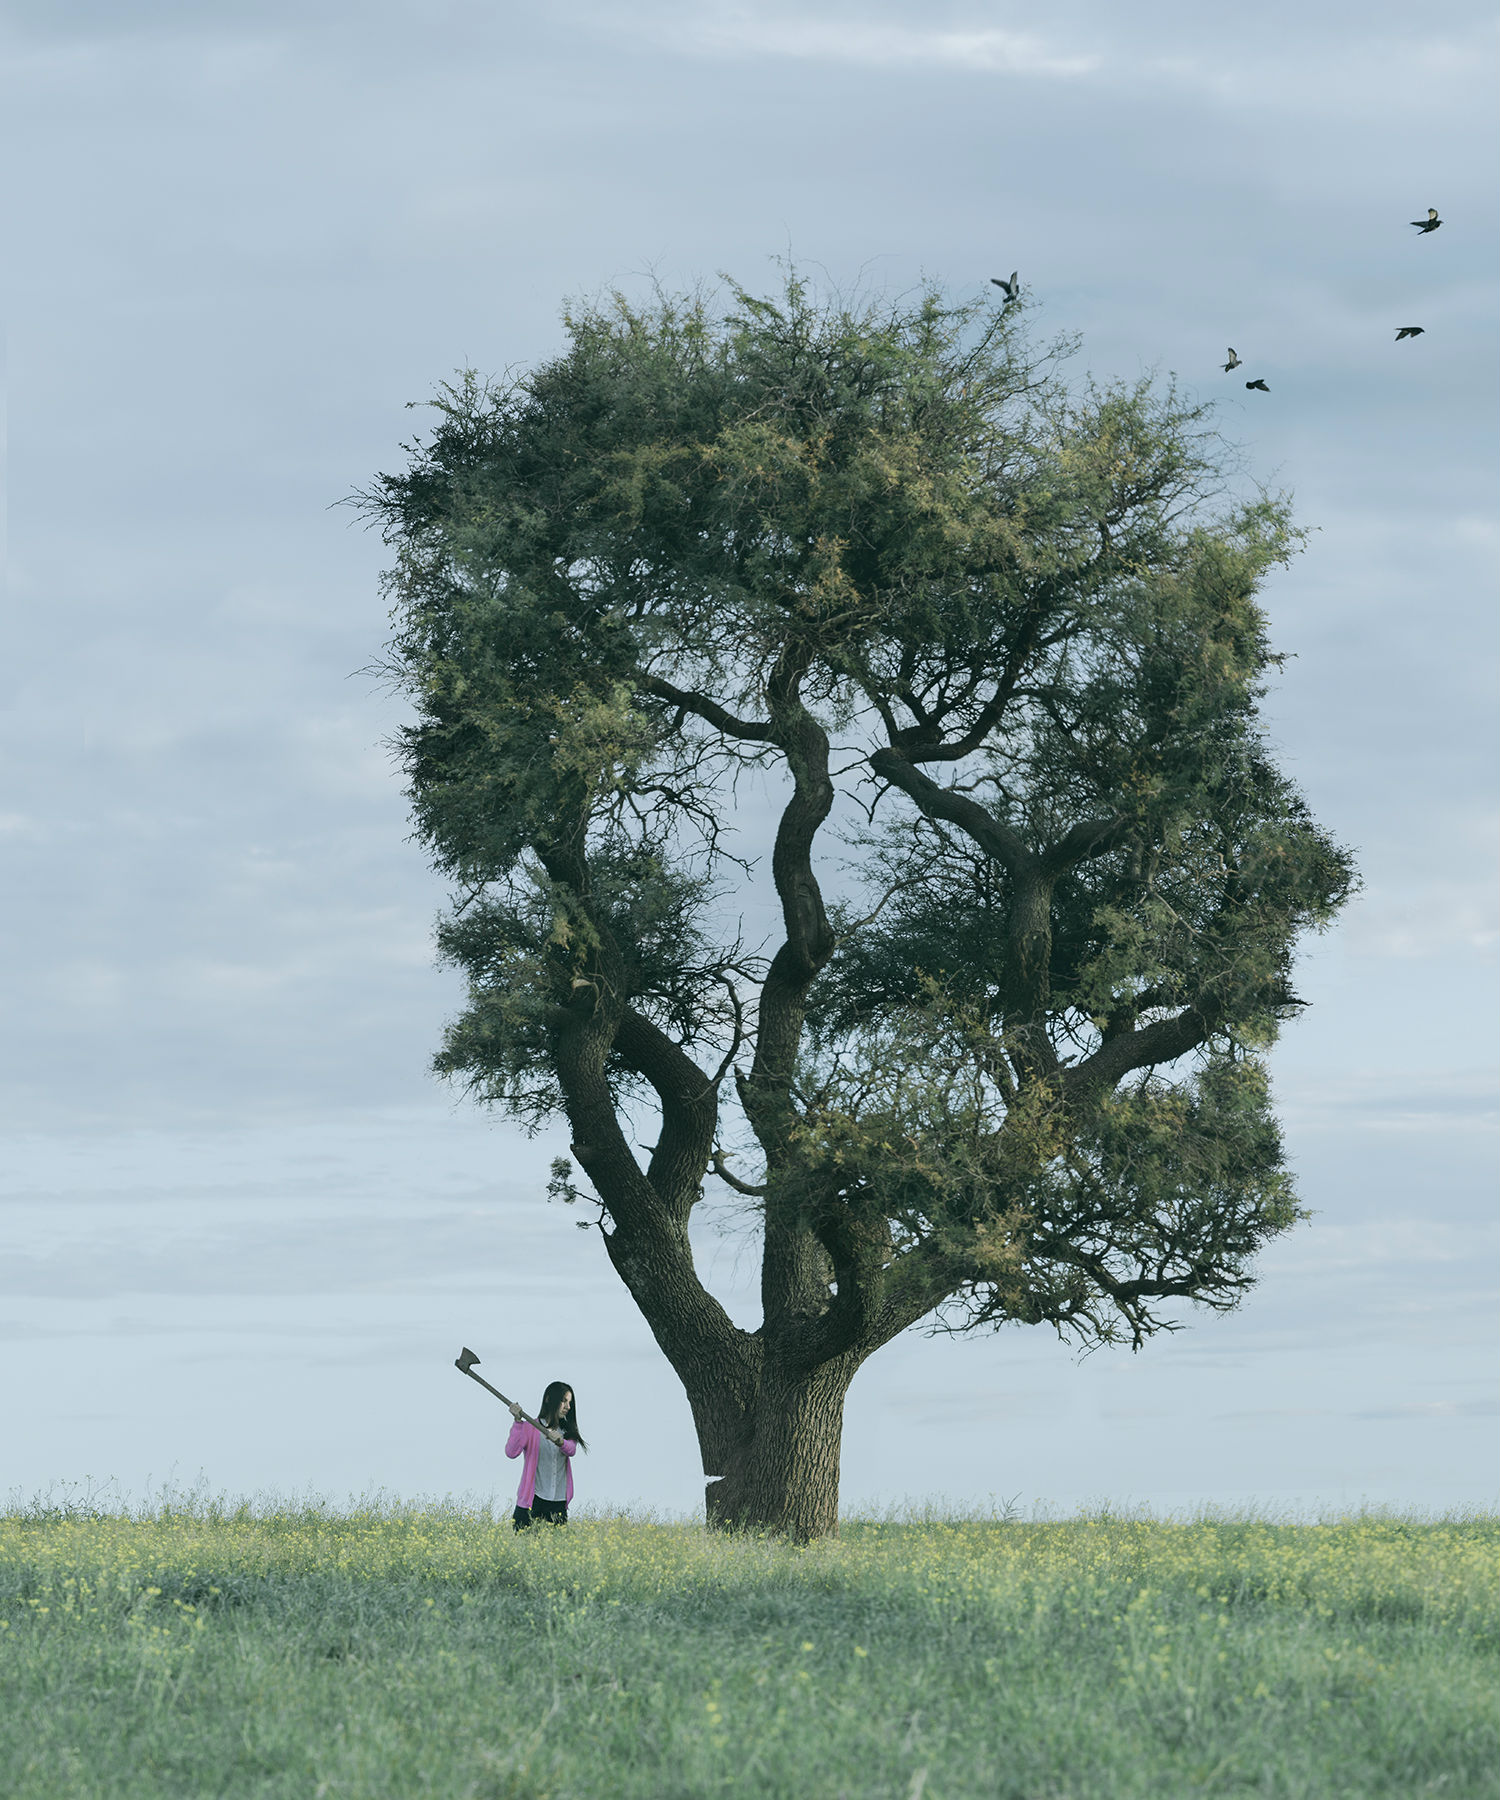 jairo alvarez photography surreal imagery colour odd illusion tree